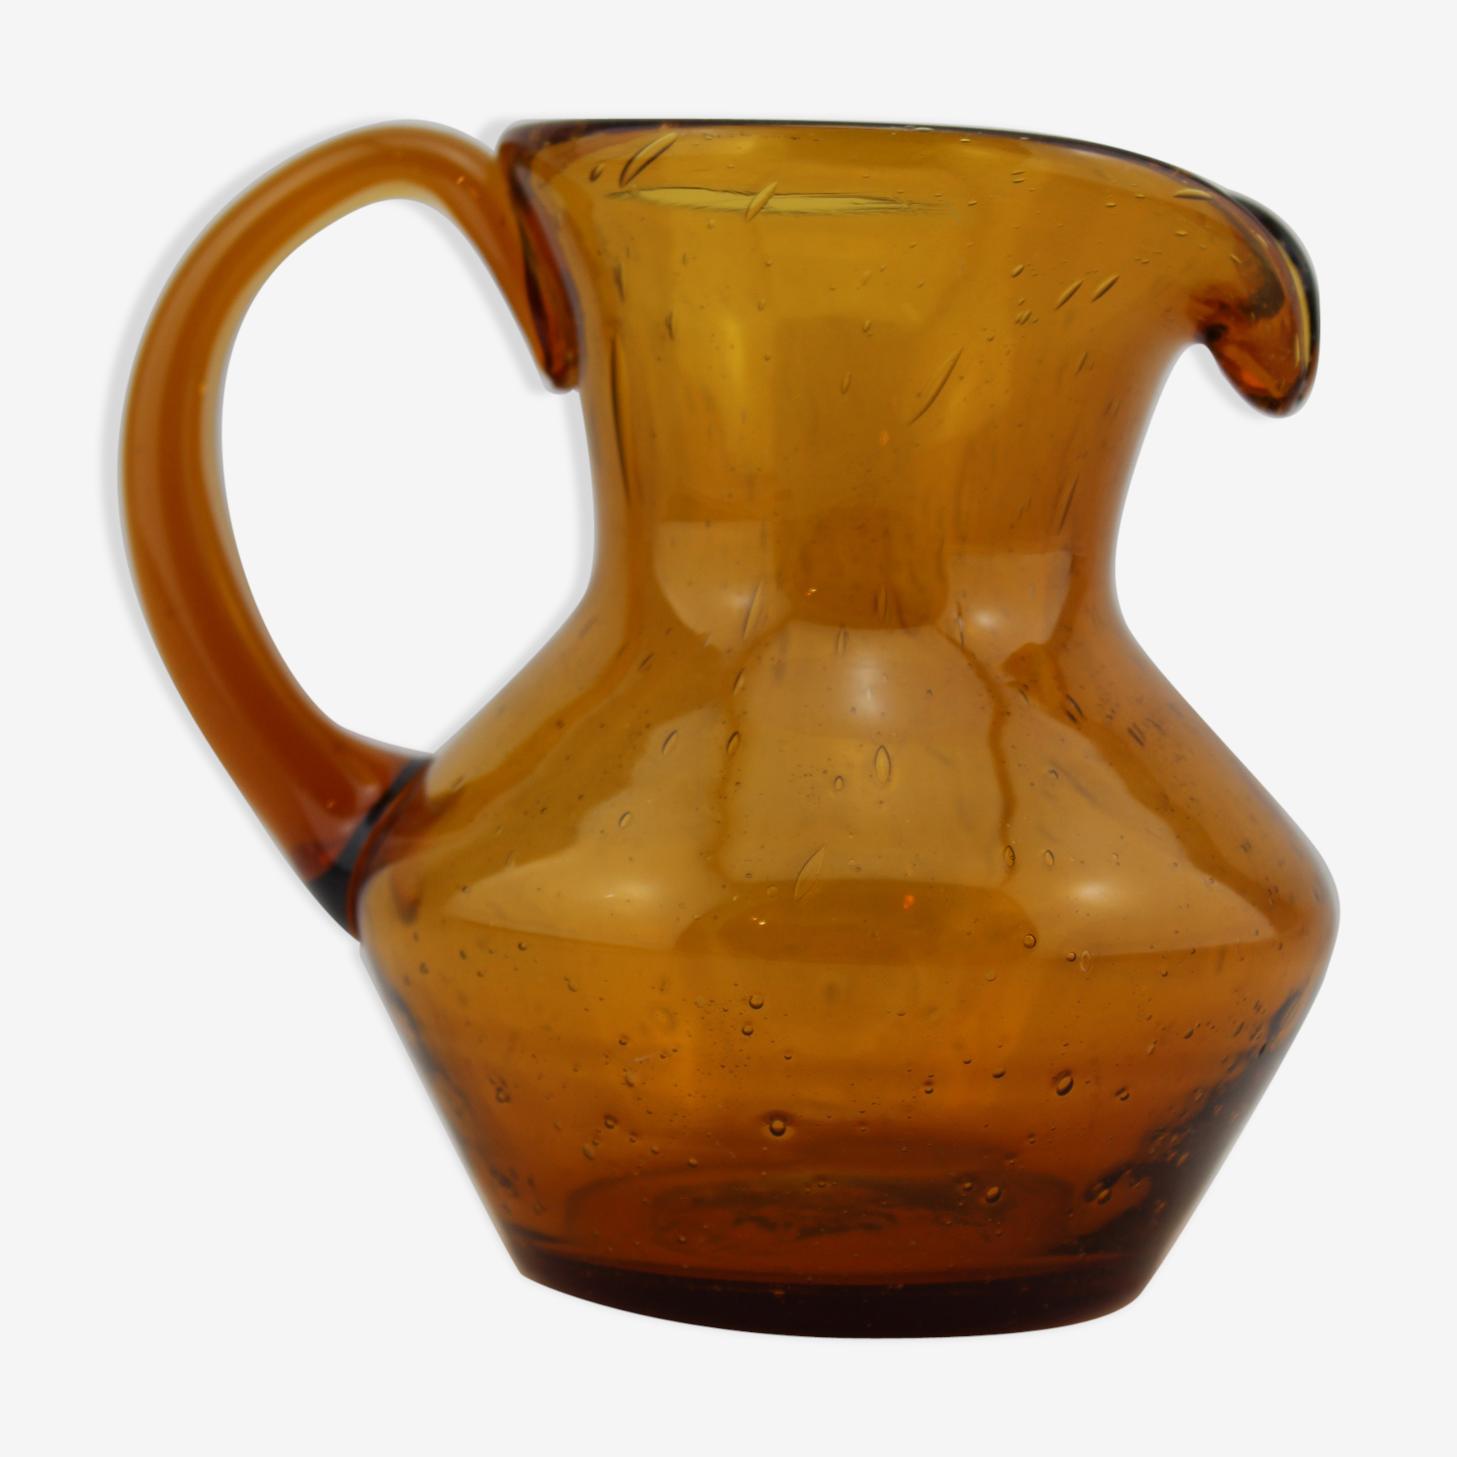 Orange pitcher Biot bubble glass